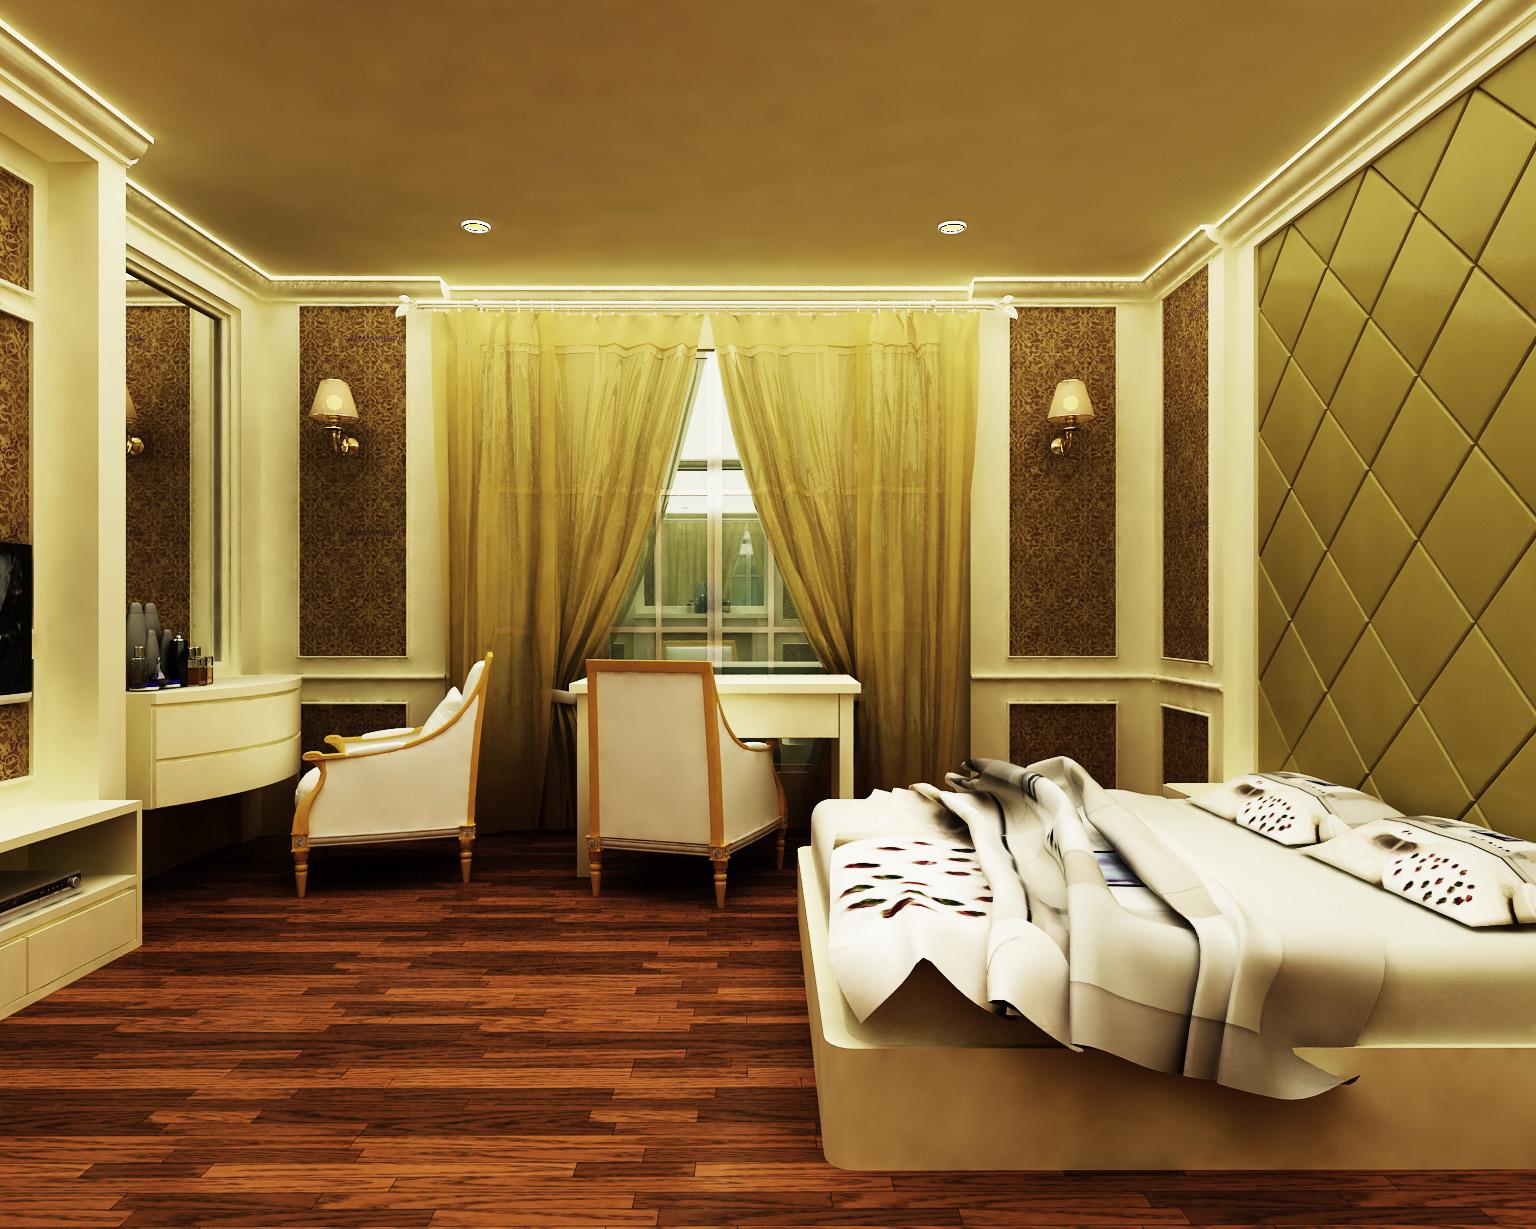 Classic bedroom design by forevalonejackk on deviantart for Bedroom designs classic